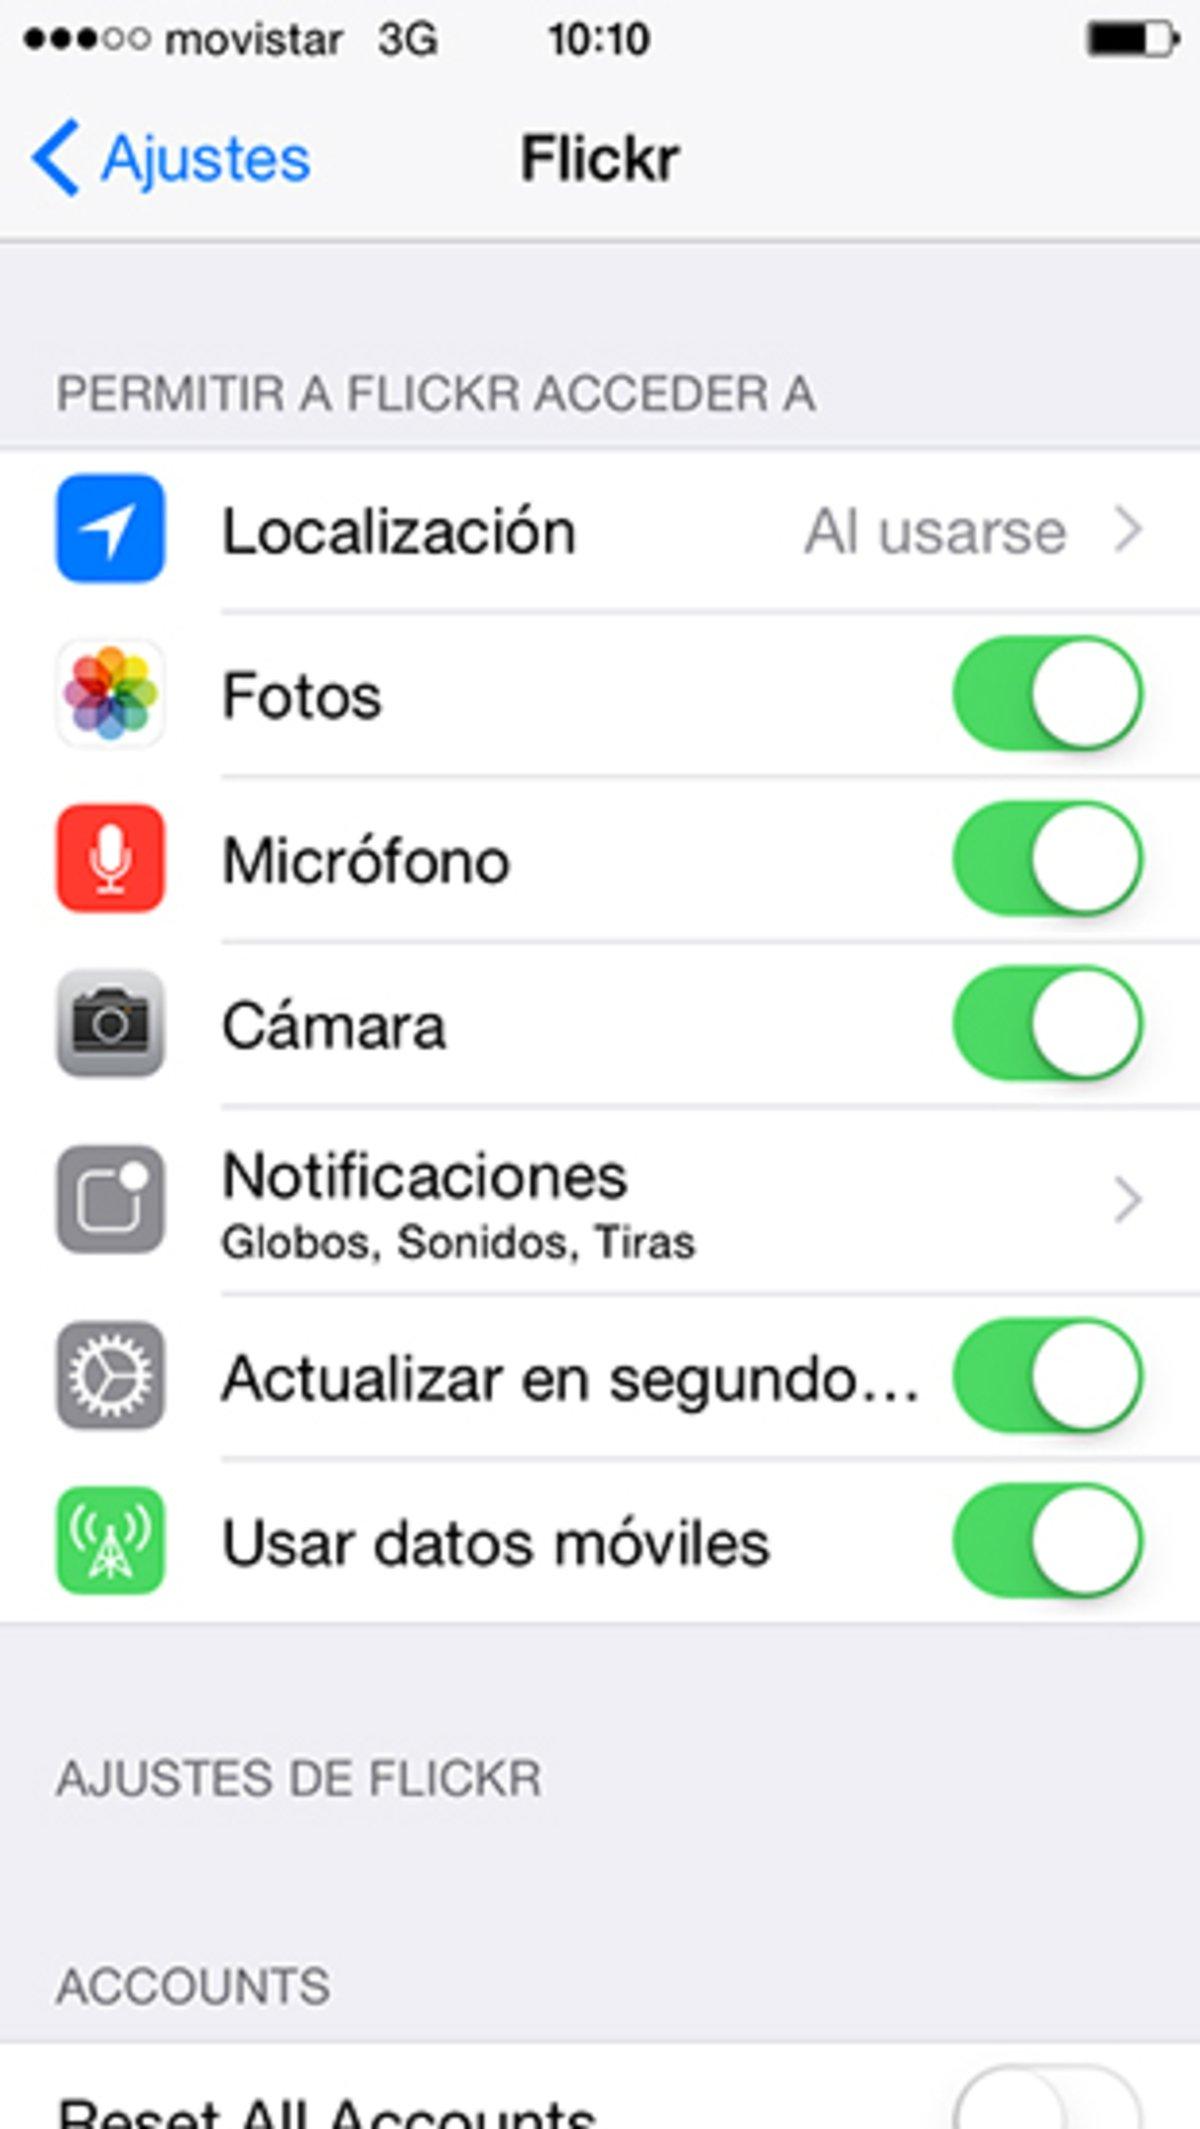 gestionar-permisos-apps-iphone-ipad-2